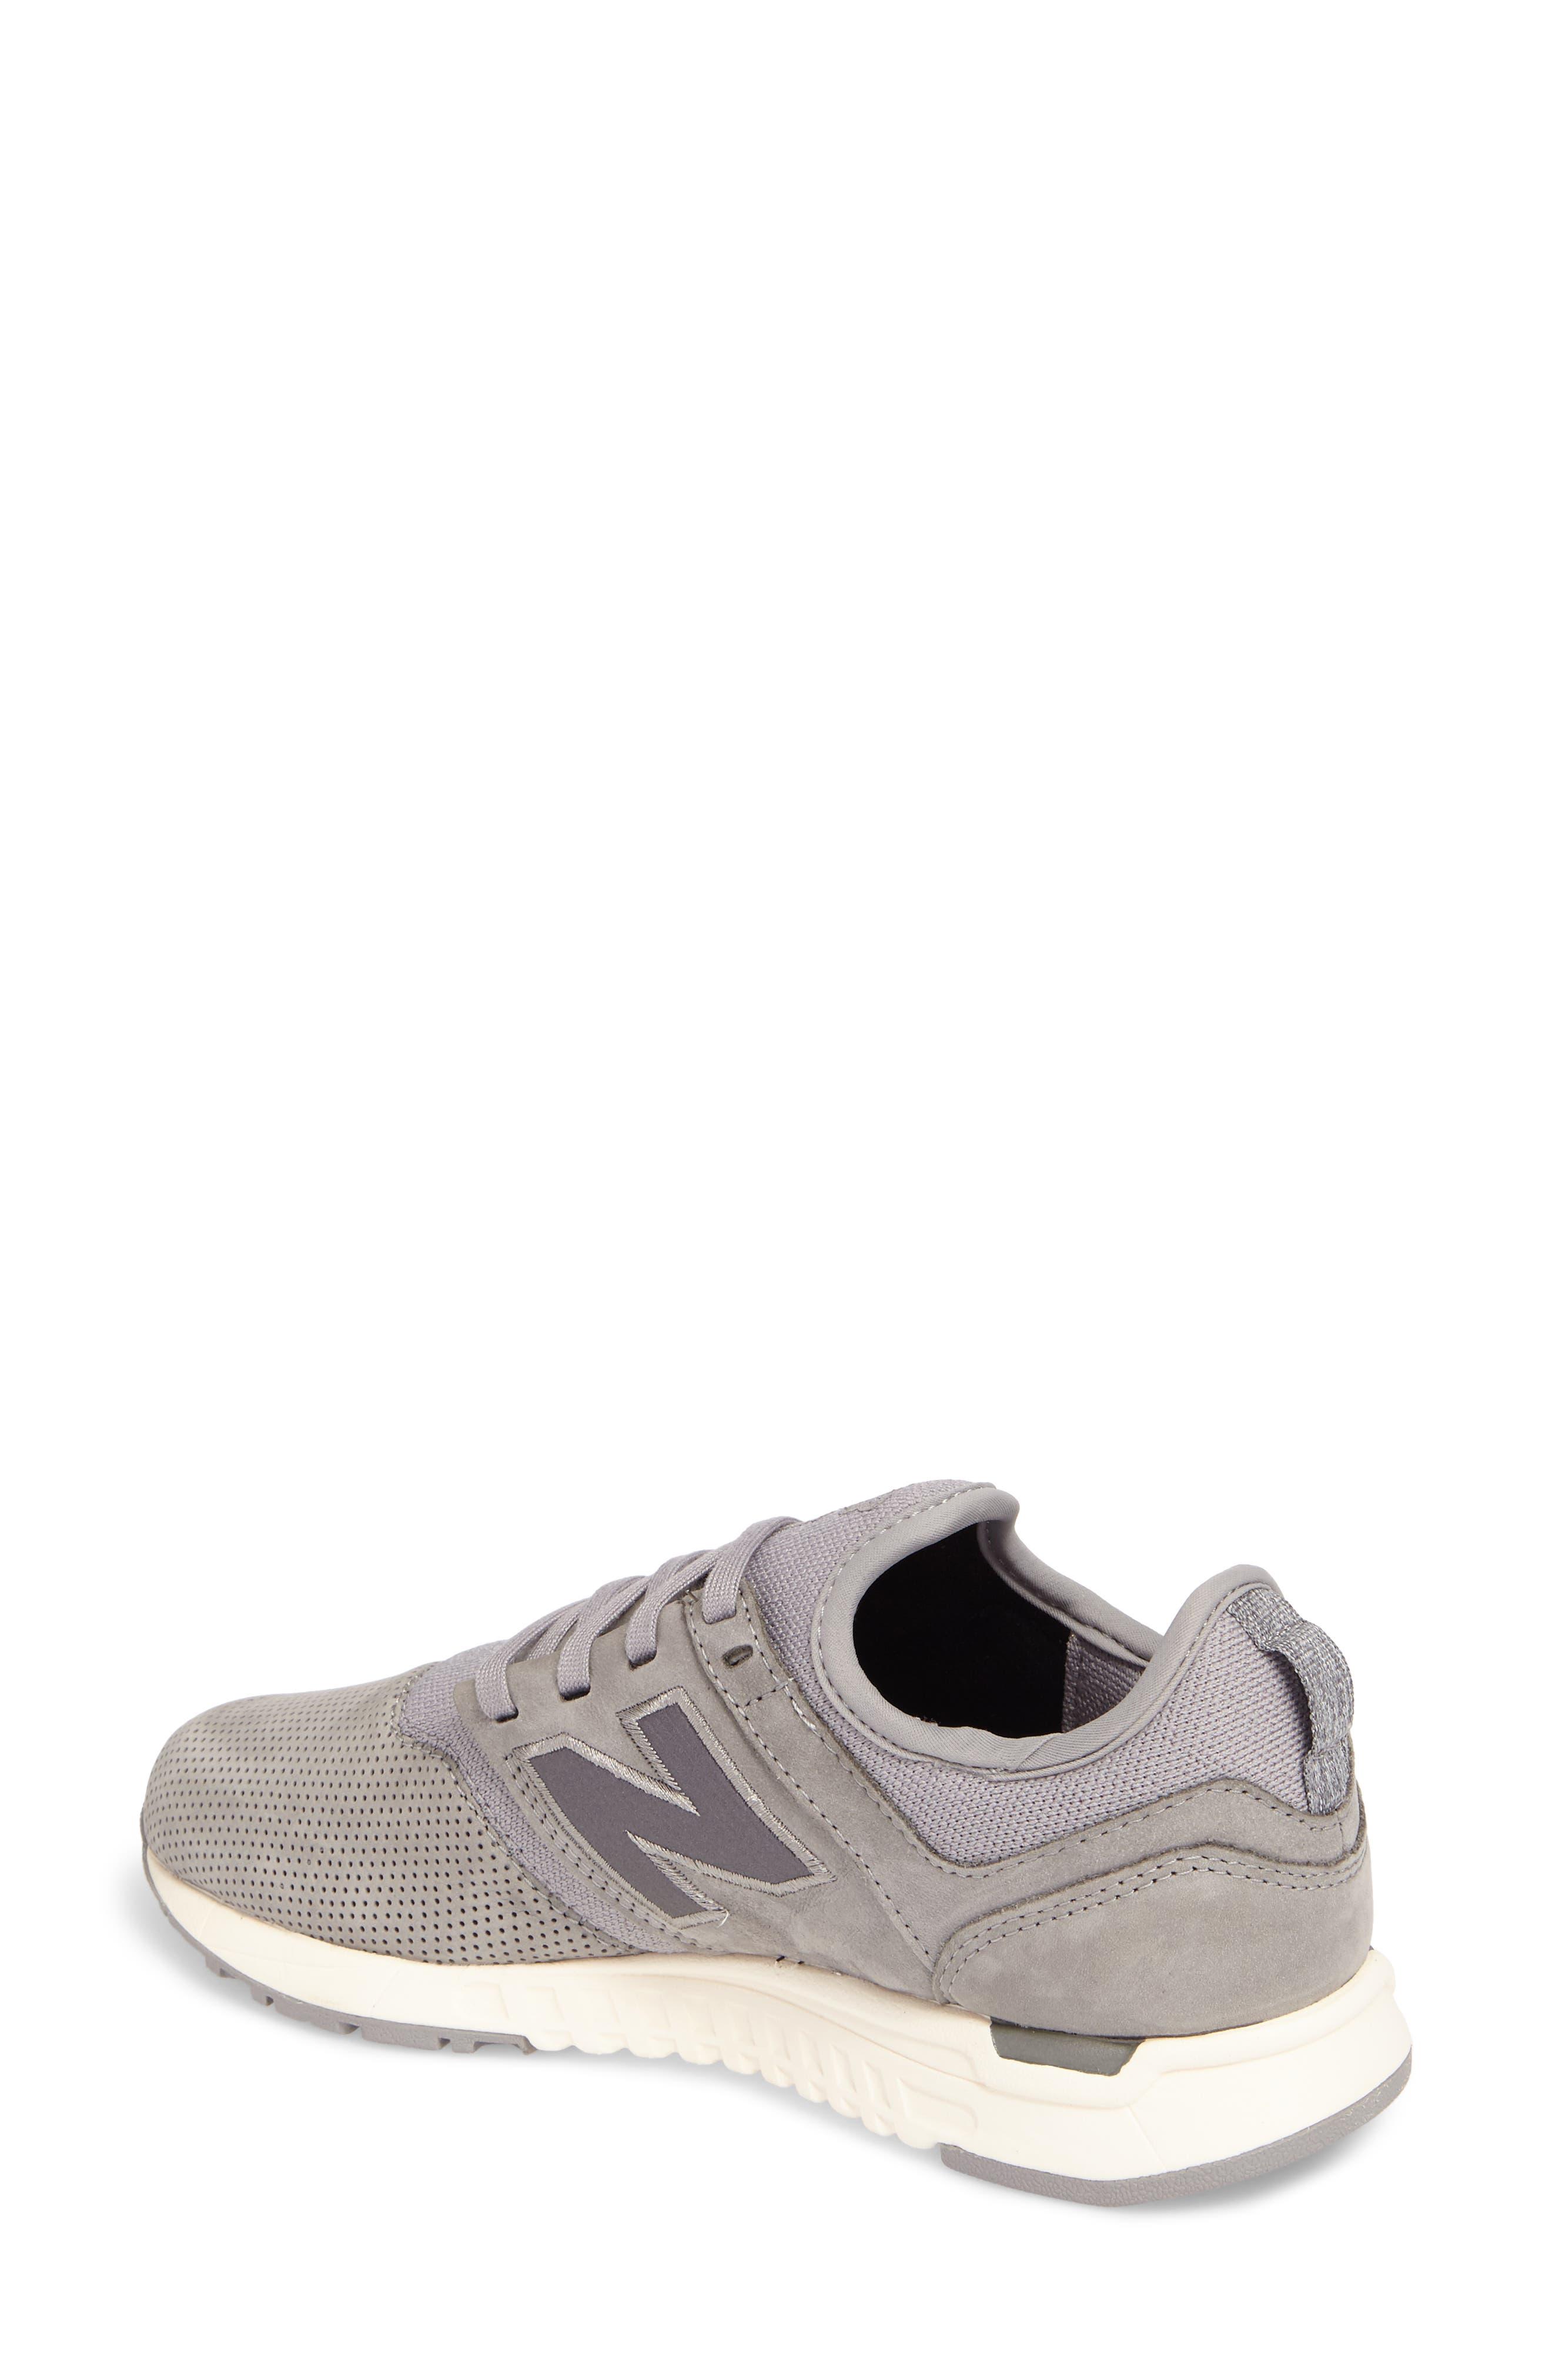 Sport Style 247 Sneaker,                             Alternate thumbnail 2, color,                             Marblehead